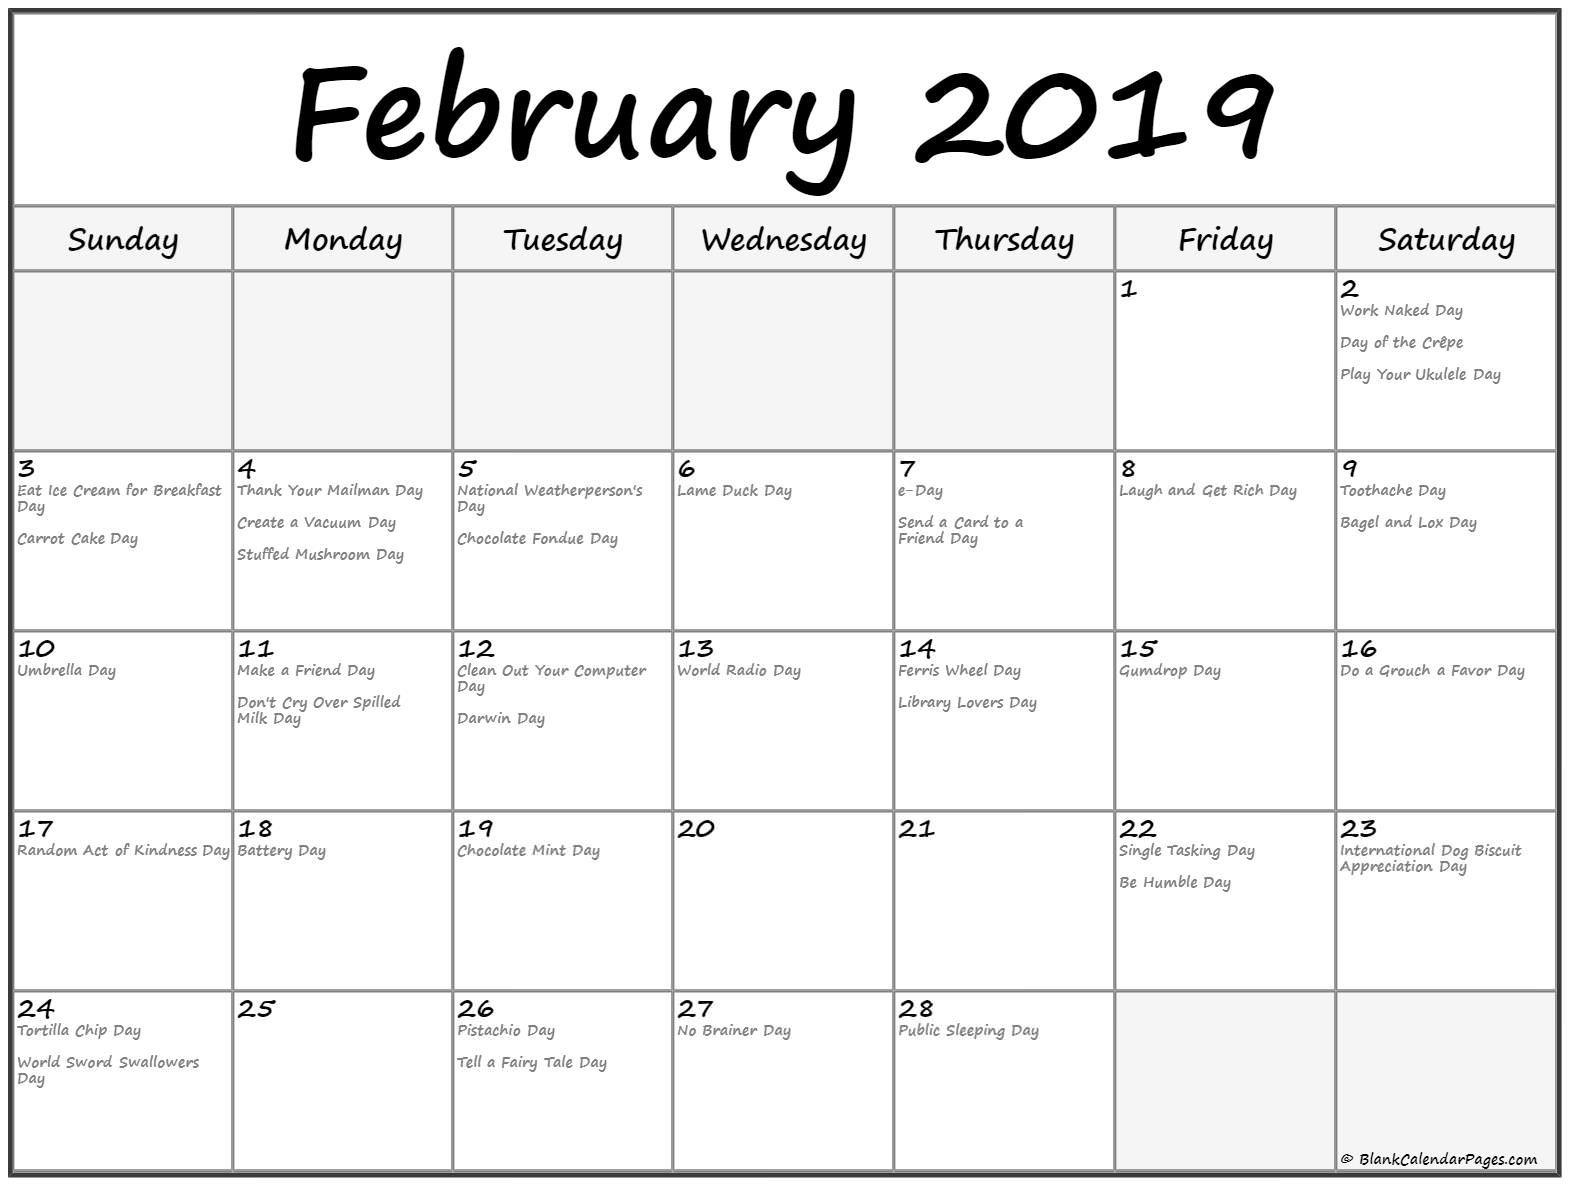 February 2019 Calendar With Funny Holidays February 2019